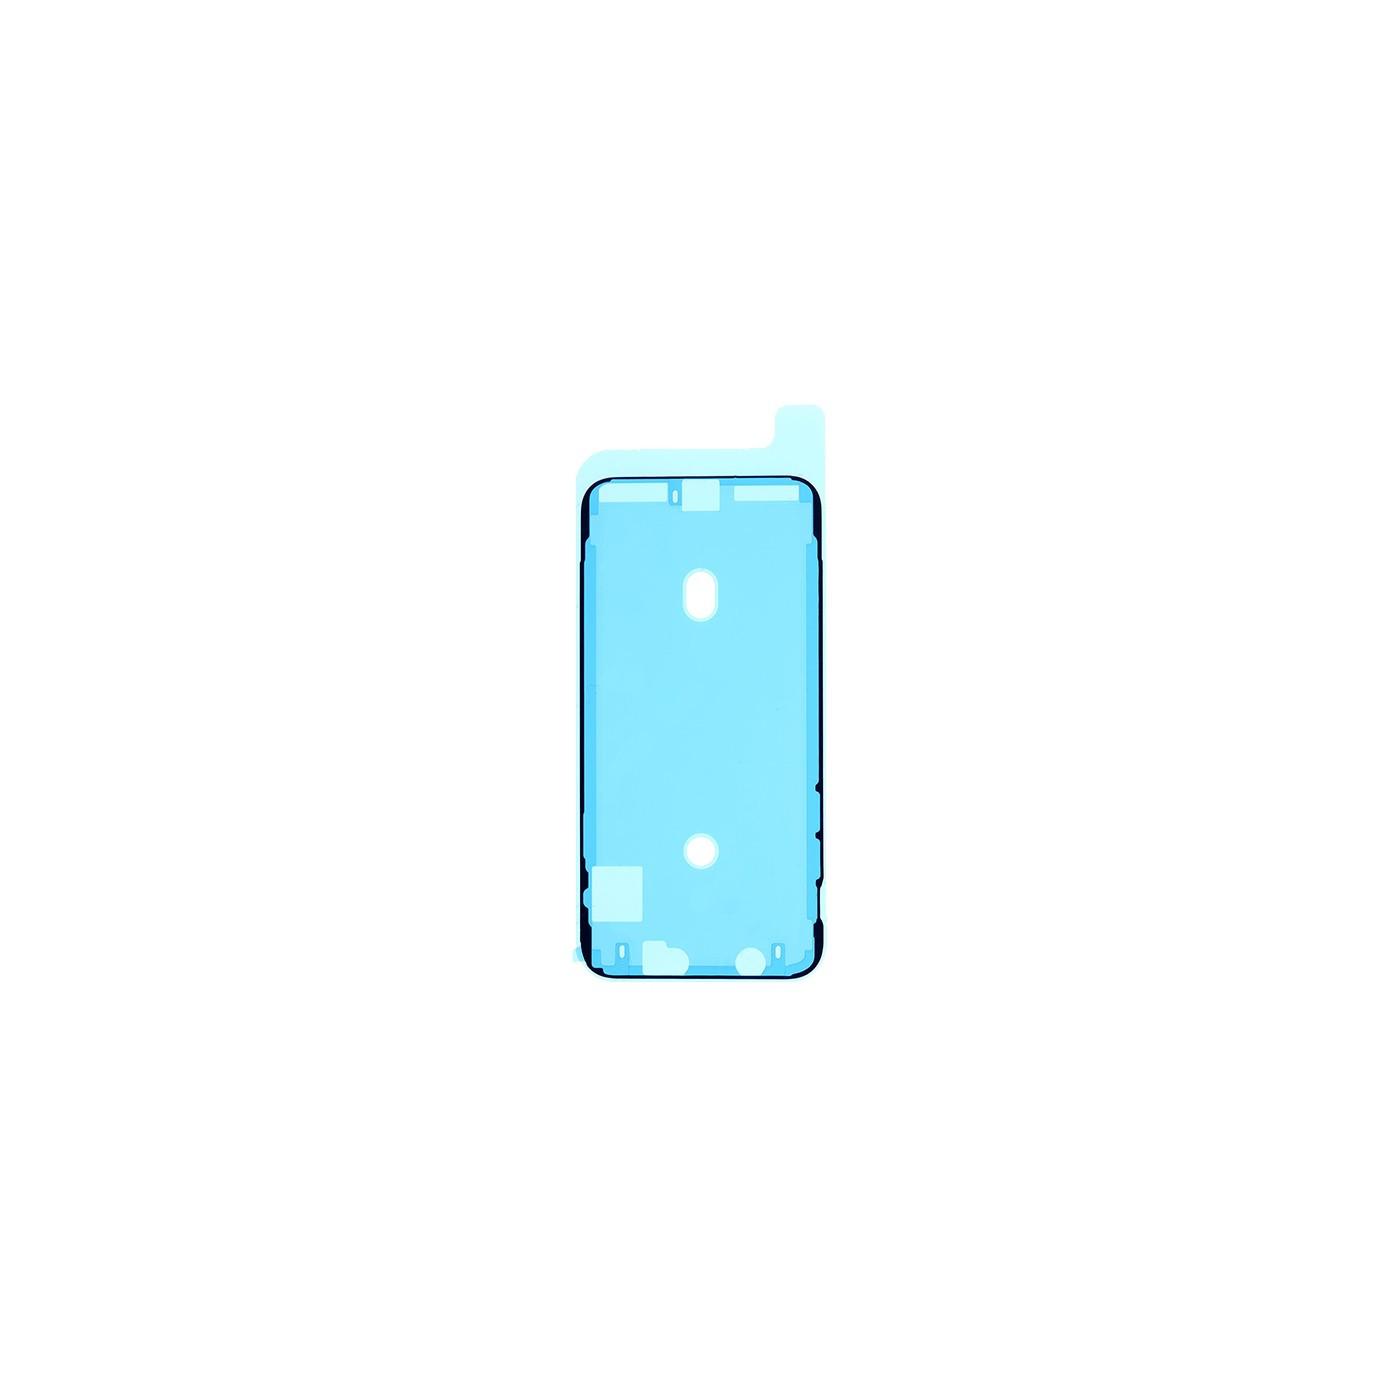 de doble cara adhesiva-pantalla LCD para el iphone X a prueba de agua